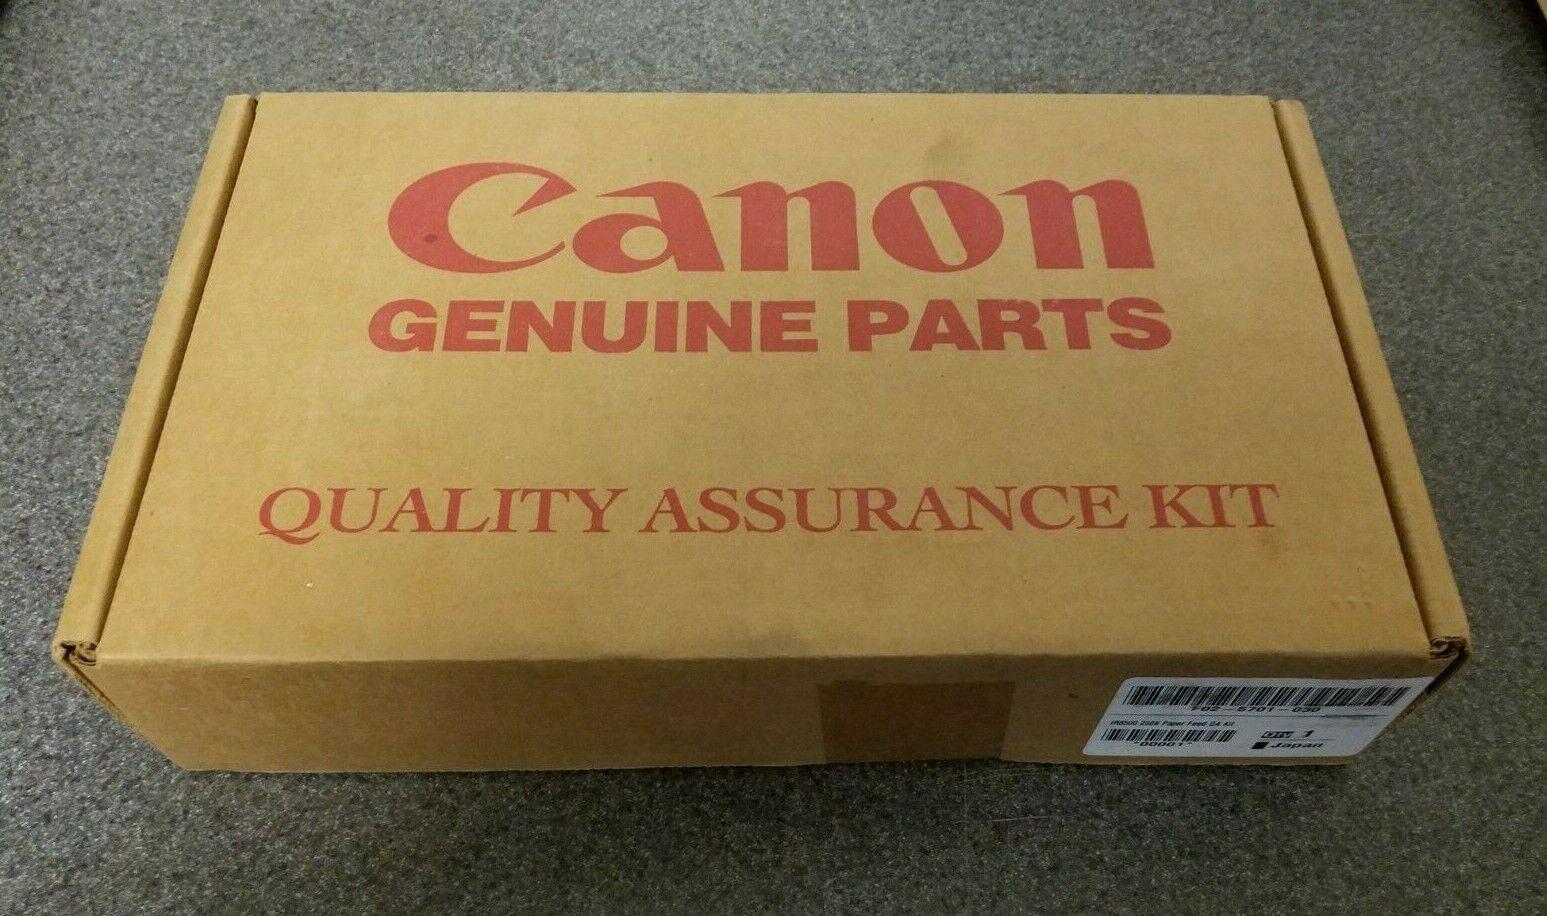 CANON F02-5701-010 PAPER FEED QA KIT GENUINE 250K